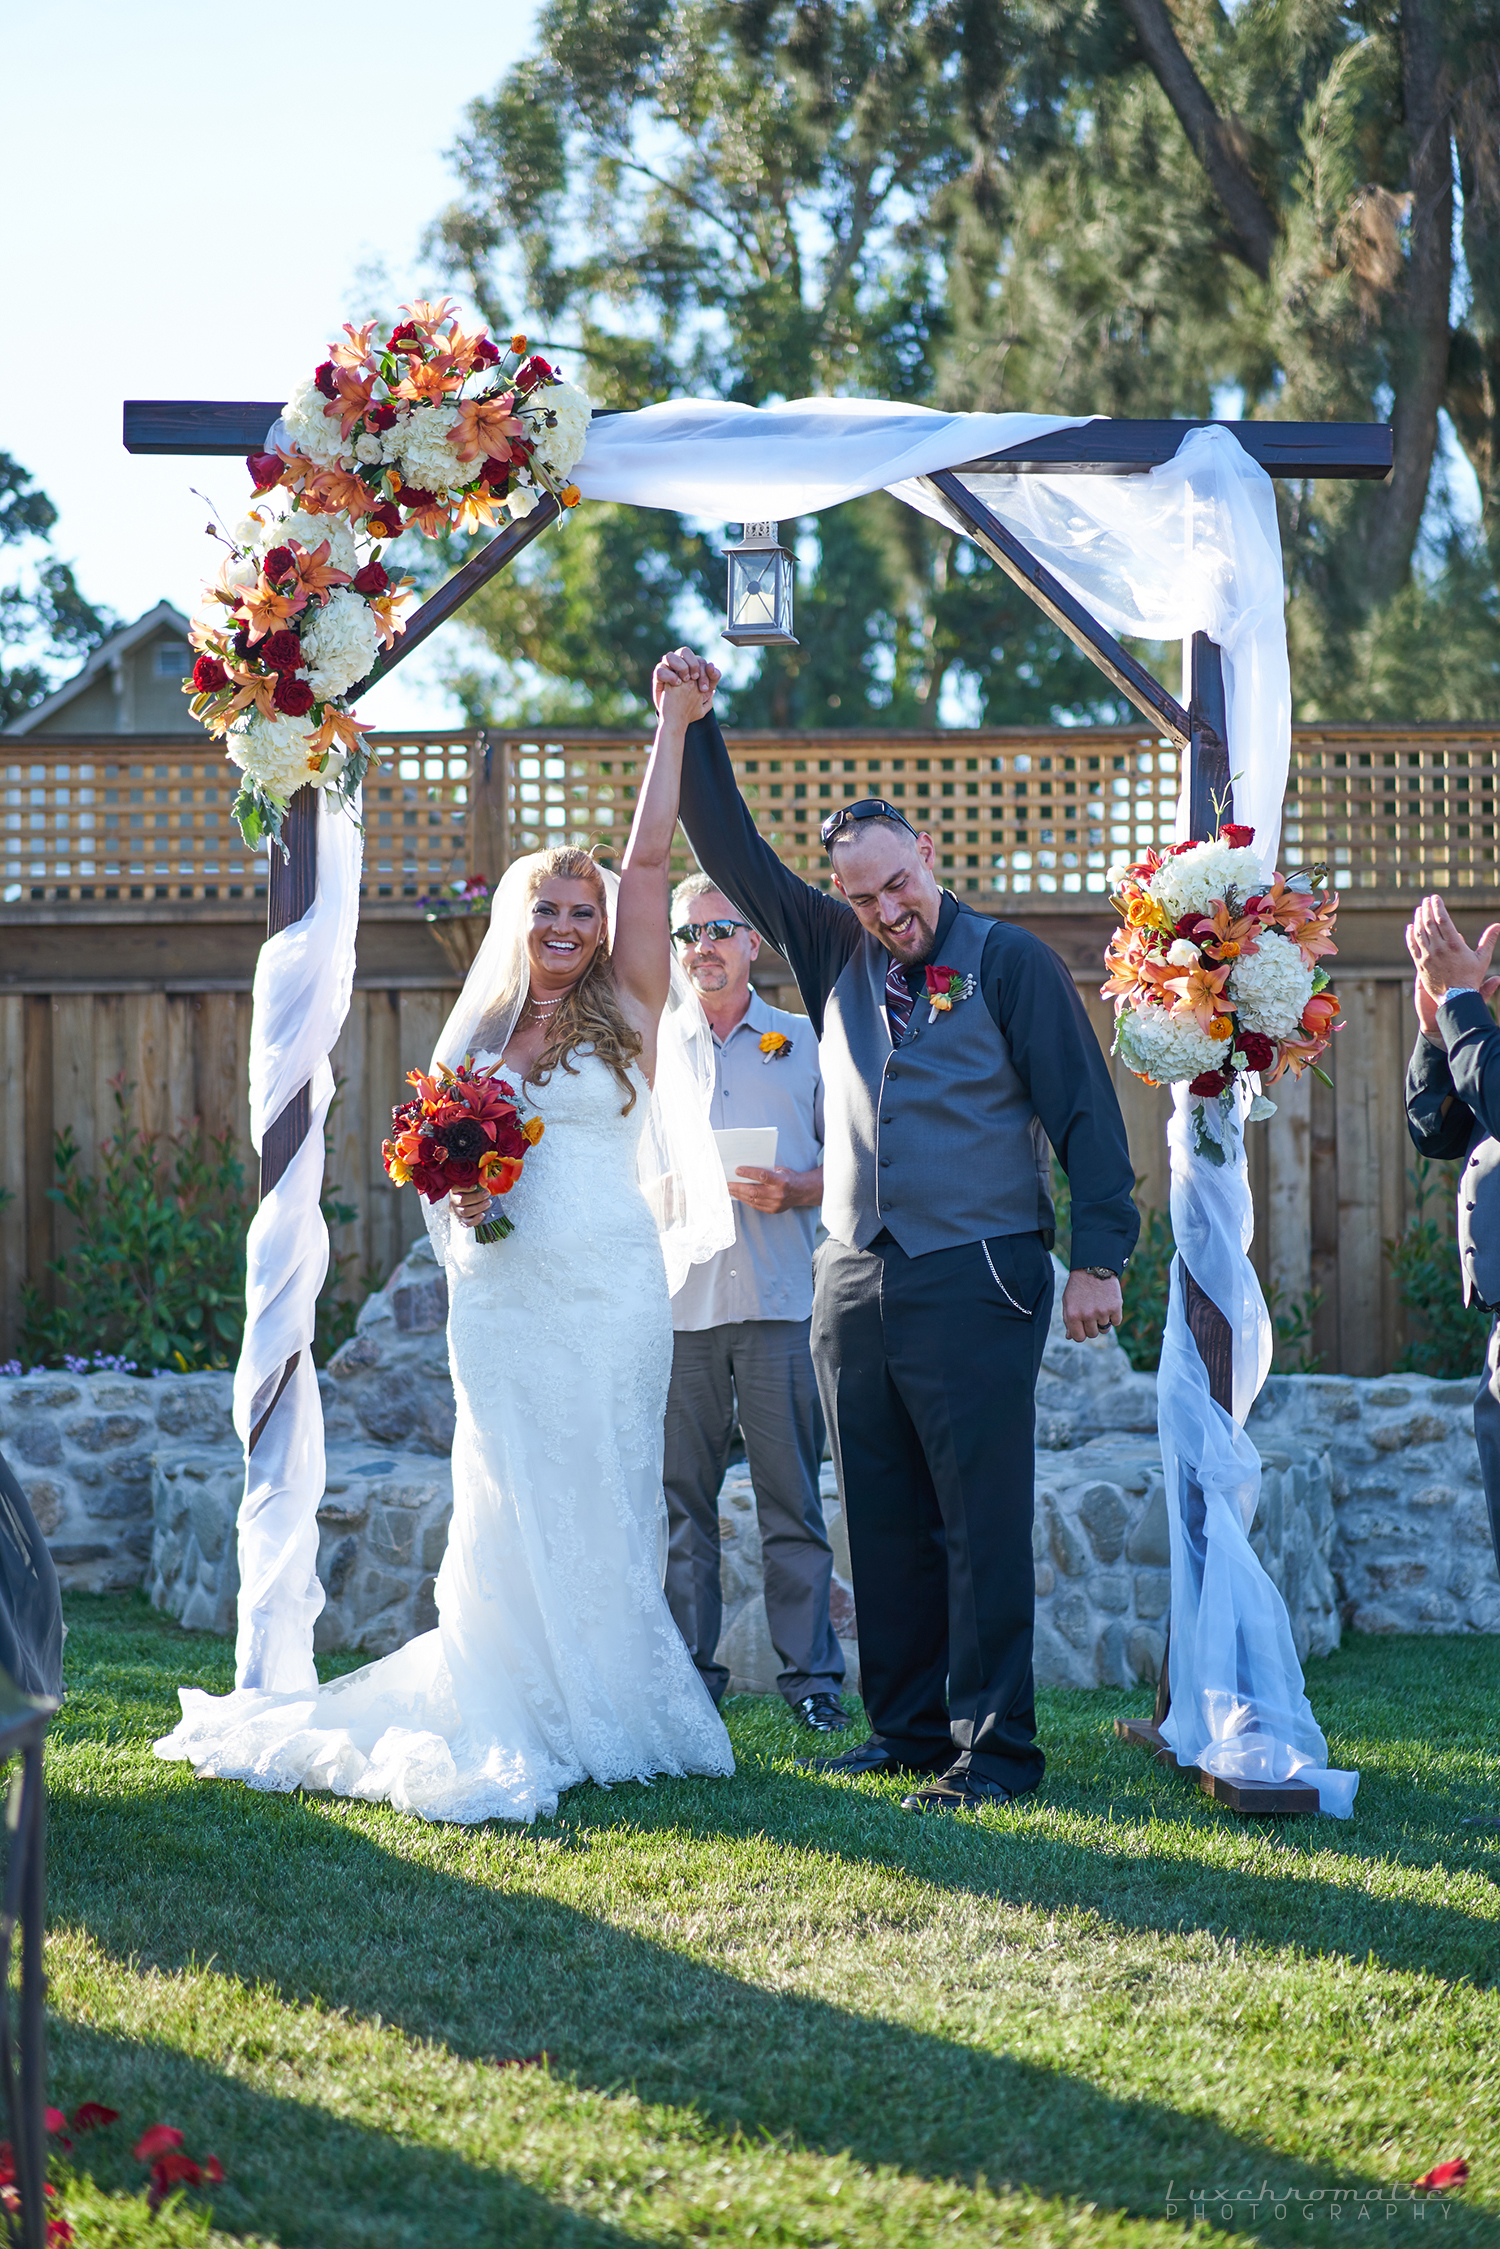 081217_Rachel_Chris_a0542-weddingdress-bride-weddingphotography-weddingphotographer-bridal-groom-wedding-engagementring-proposal-brides-diamondring-sonyalpha-sony-sonya9-sonya7rii-sanfrancisco-sf-bayarea-photographer-profoto-murrietas-well.jpg